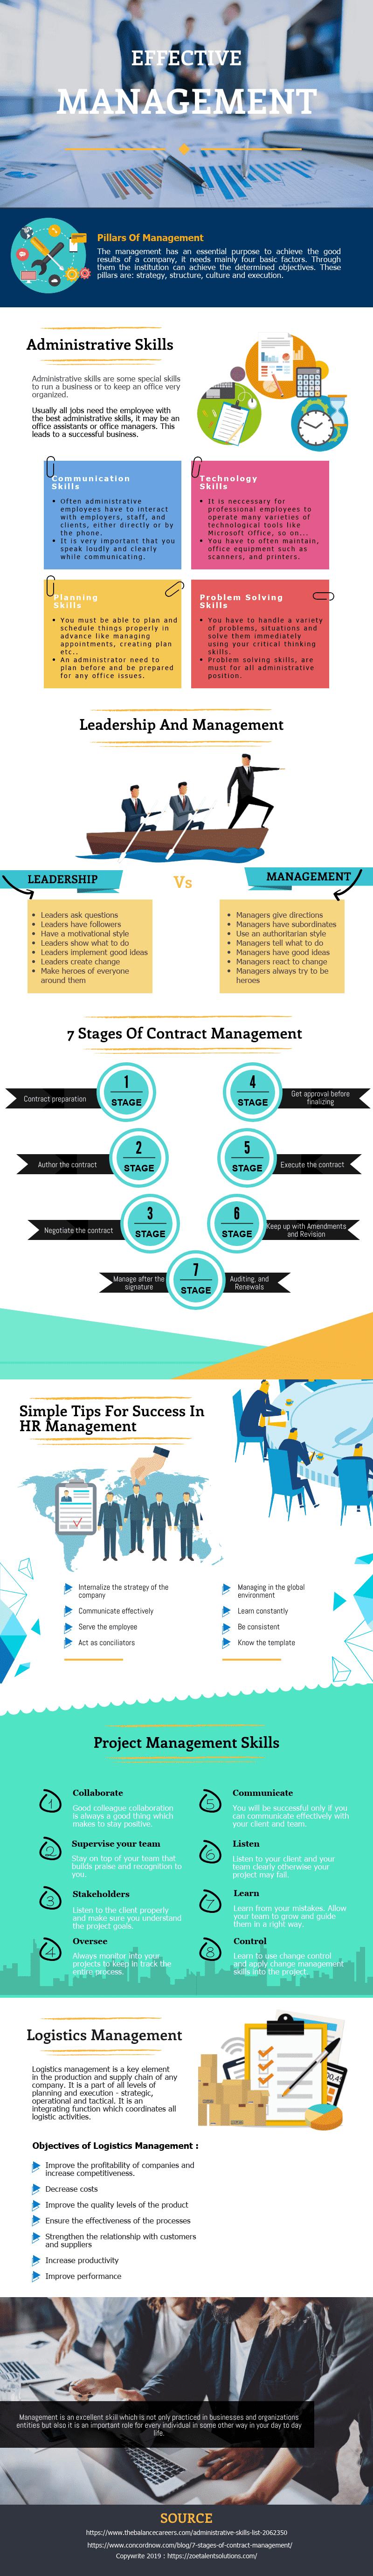 4 Benefits Of Digital Marketing